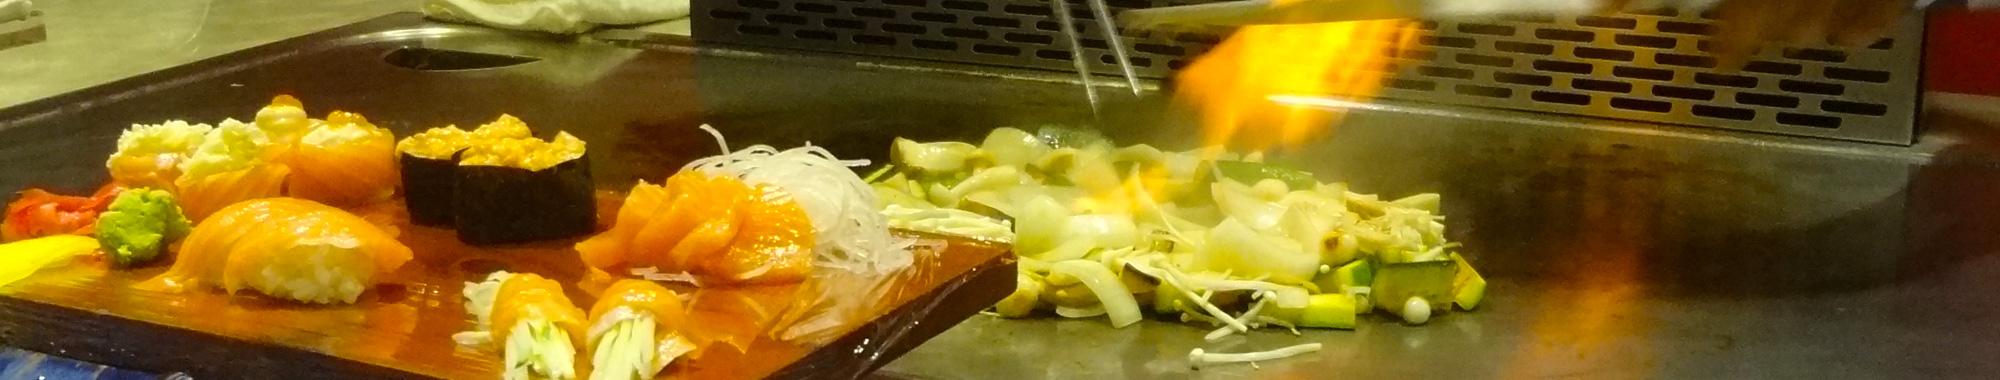 De Gouden Wok - Teppanyaki wereld keuken